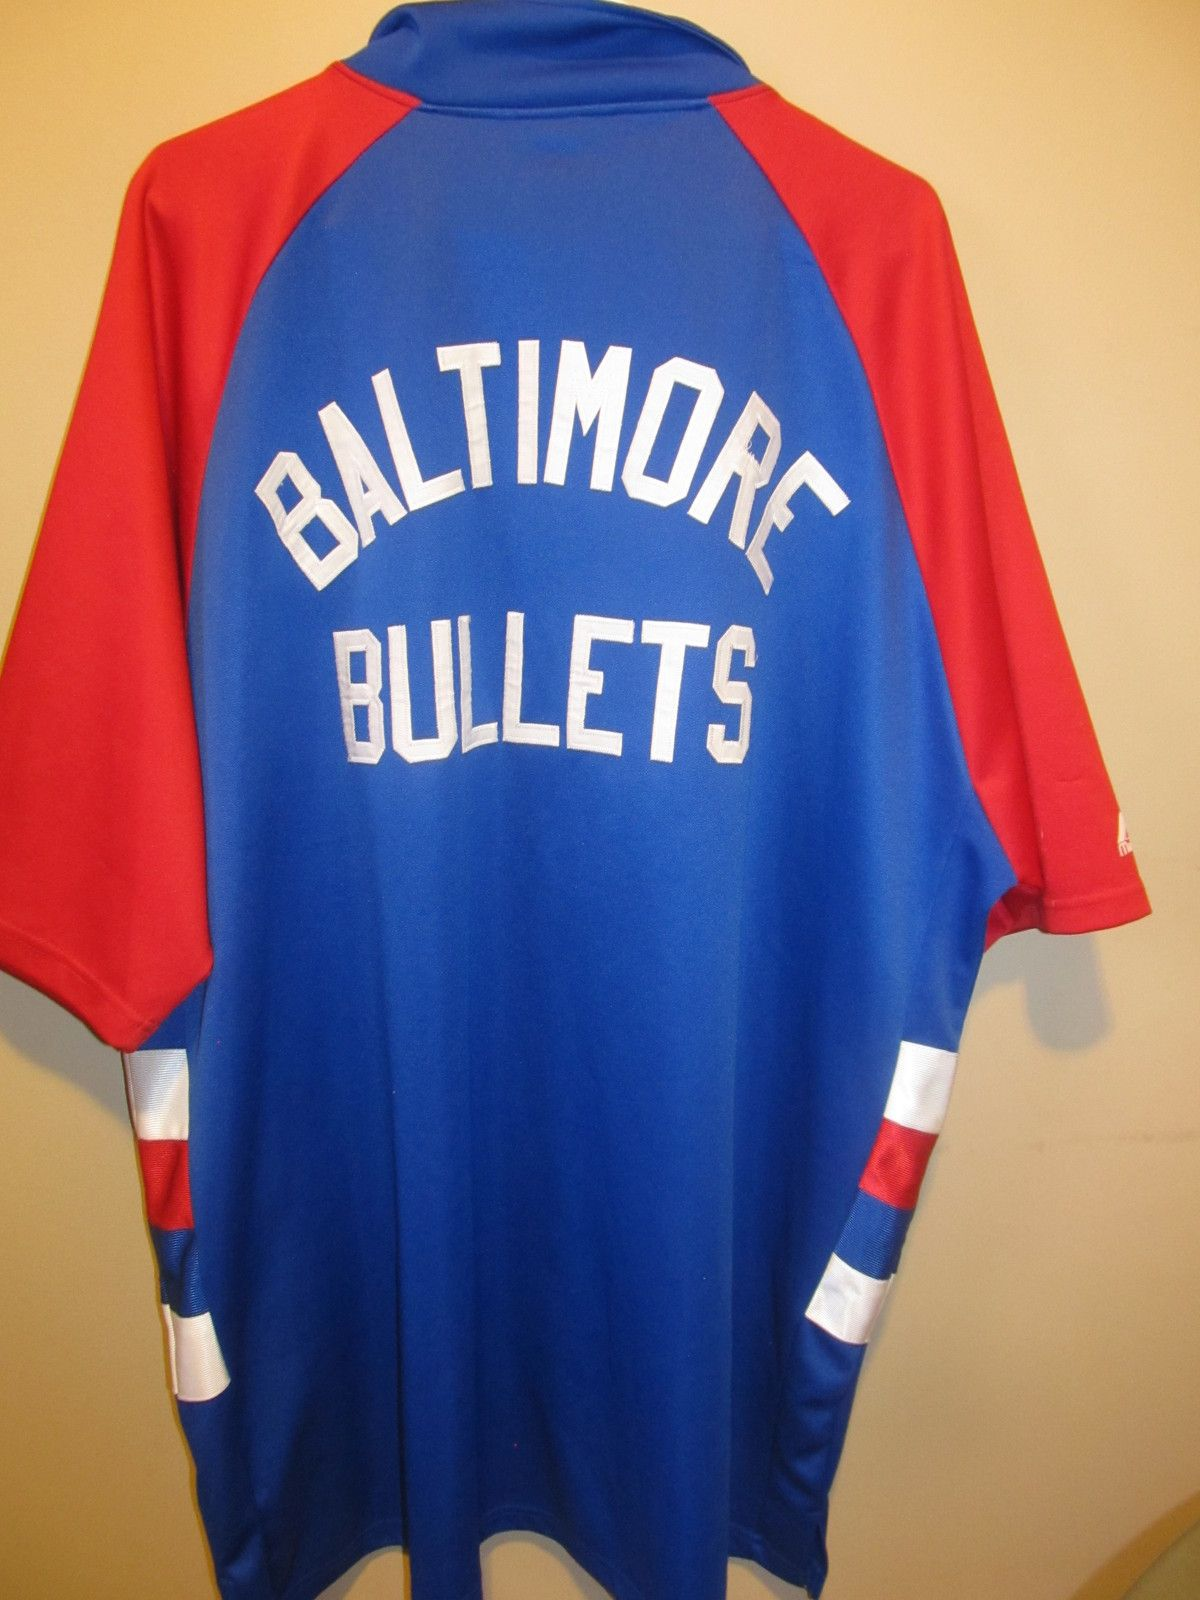 584155c94 Vintage Baltimore Bullets Shooting jersey